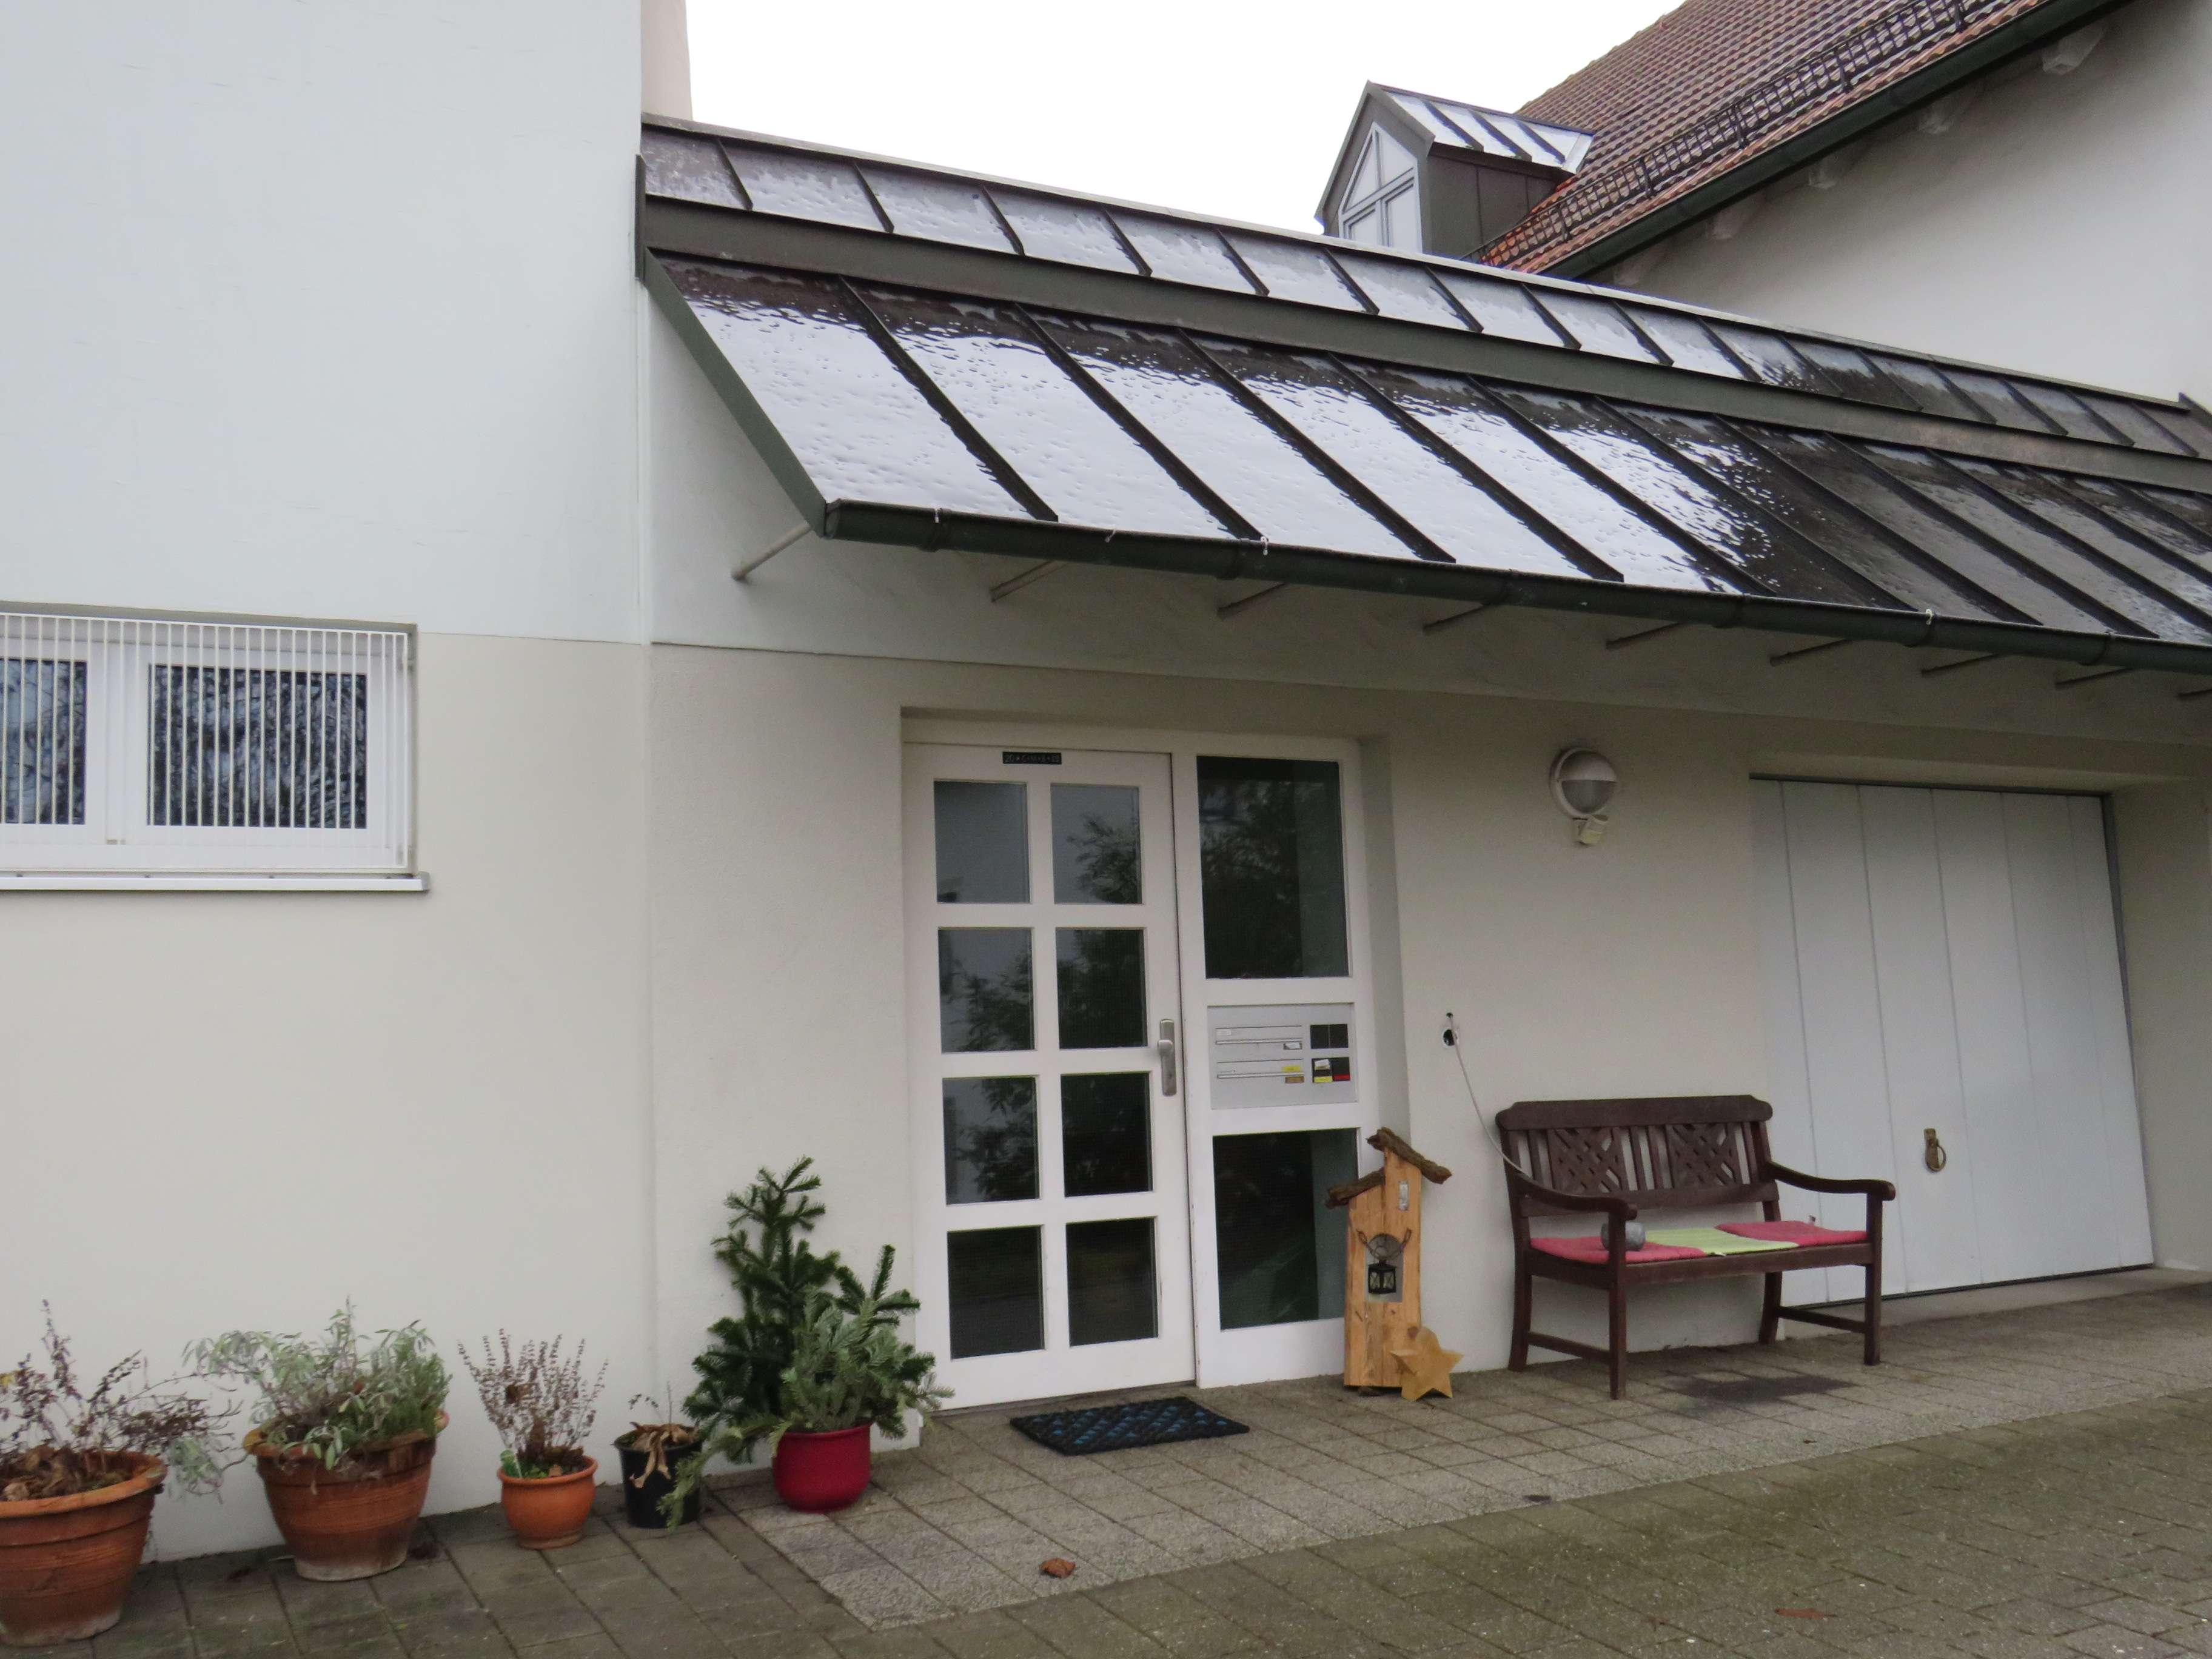 Großzügige Wohnung in Hohenried in